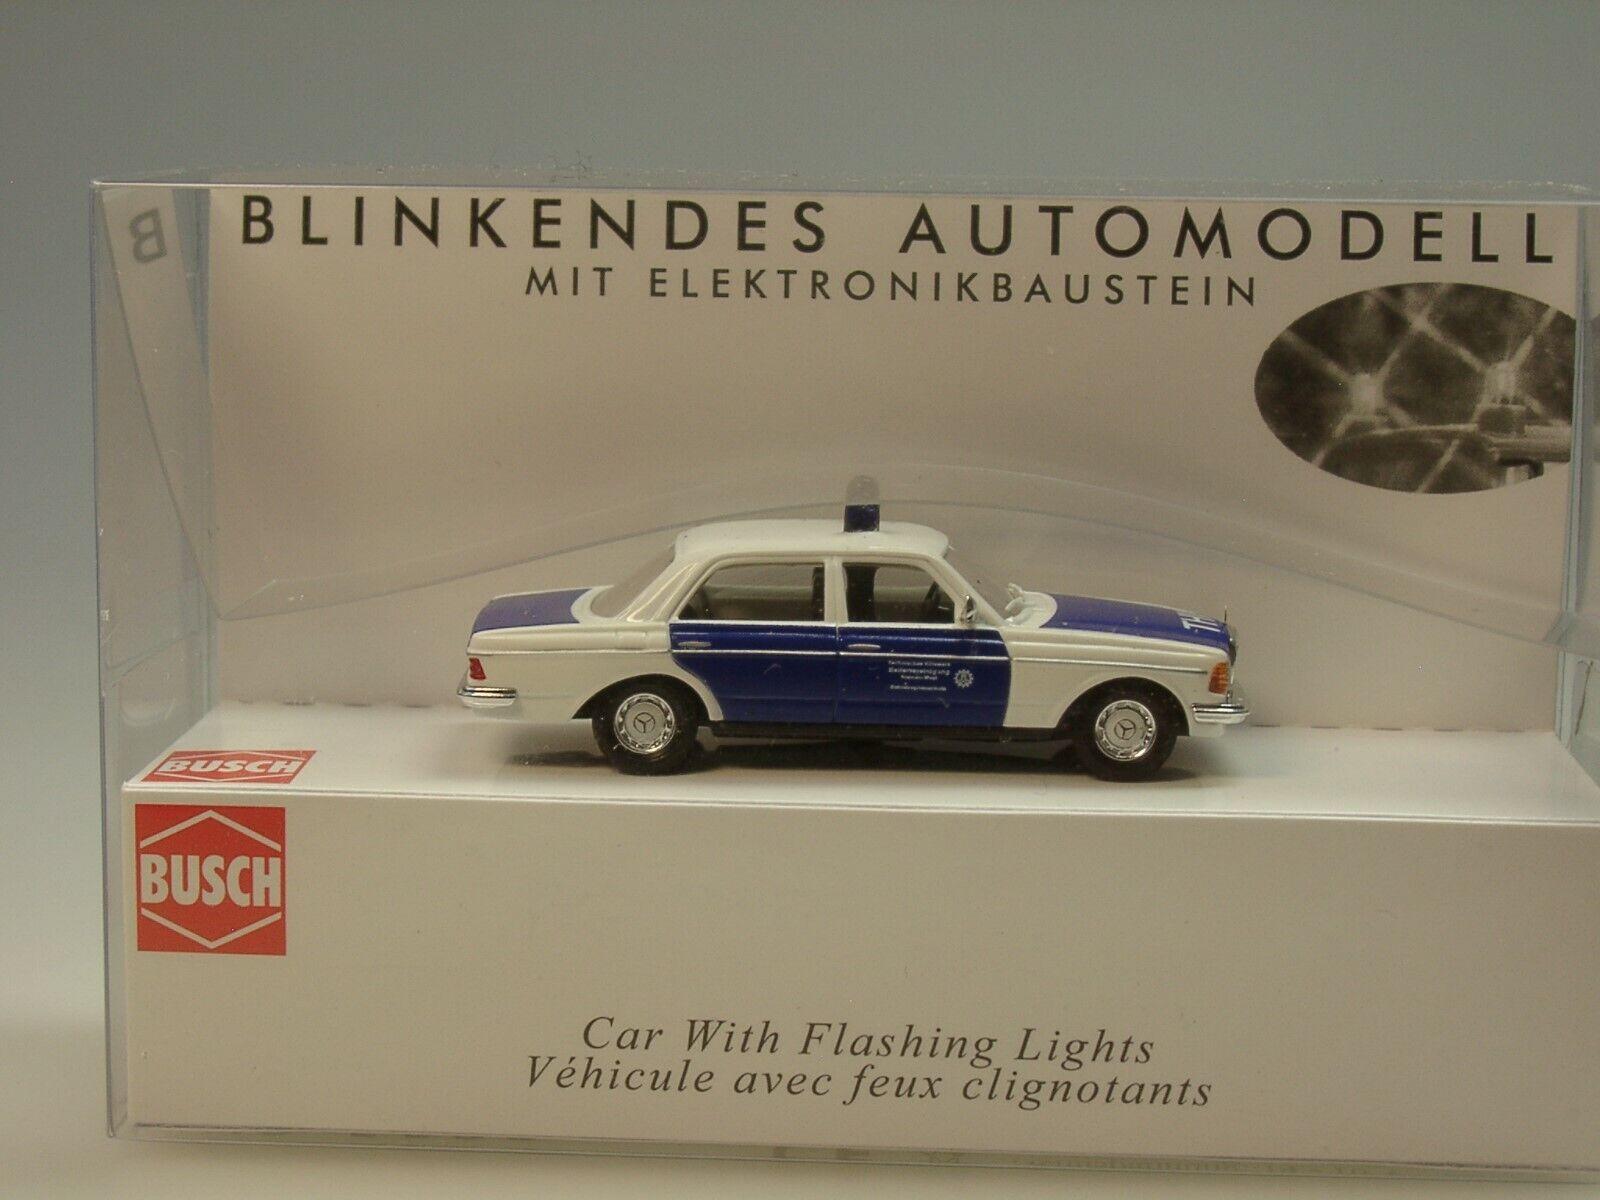 Busch Mercedes W 123 Limousine, Limousine, Limousine, THW, mit Blink-Elektronik - 5592 - 1 87 09036c